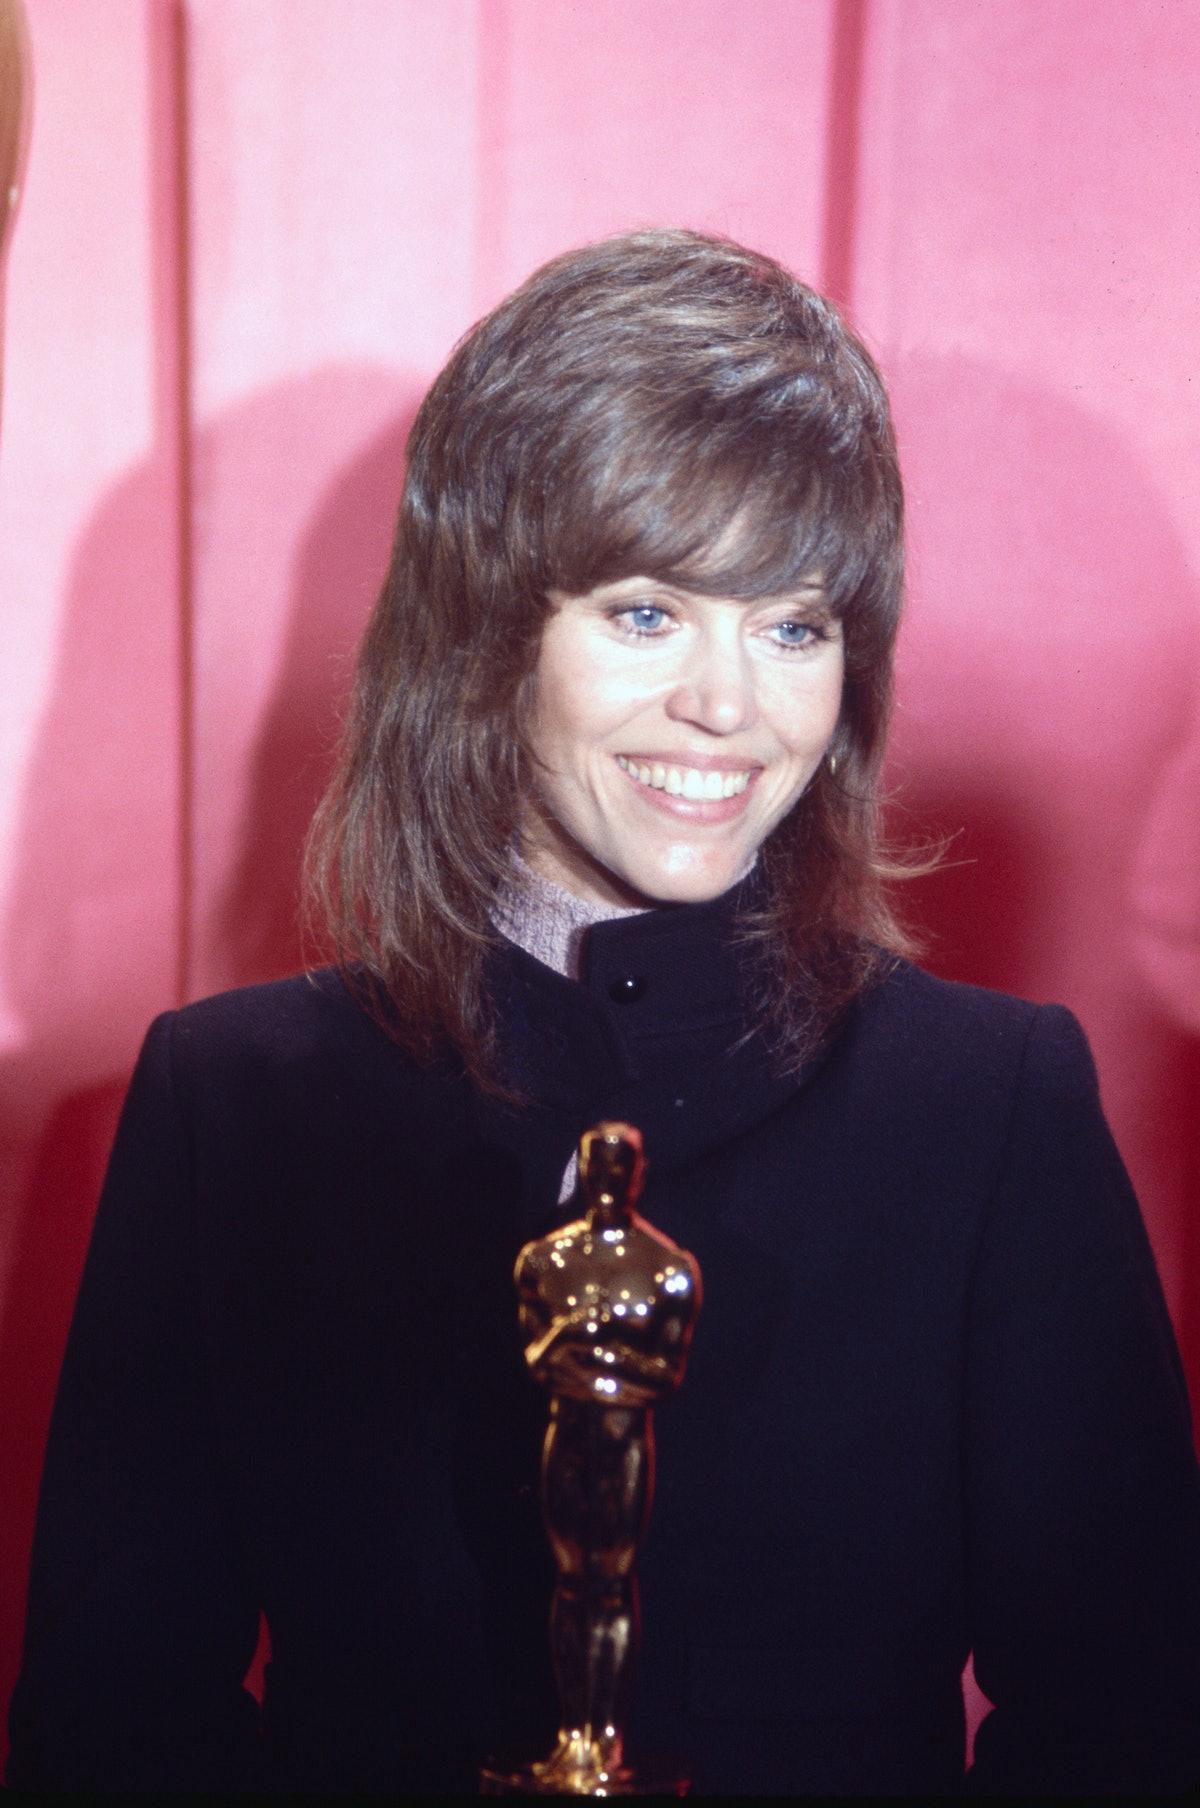 Jane Fonda wearing a Klute haircut